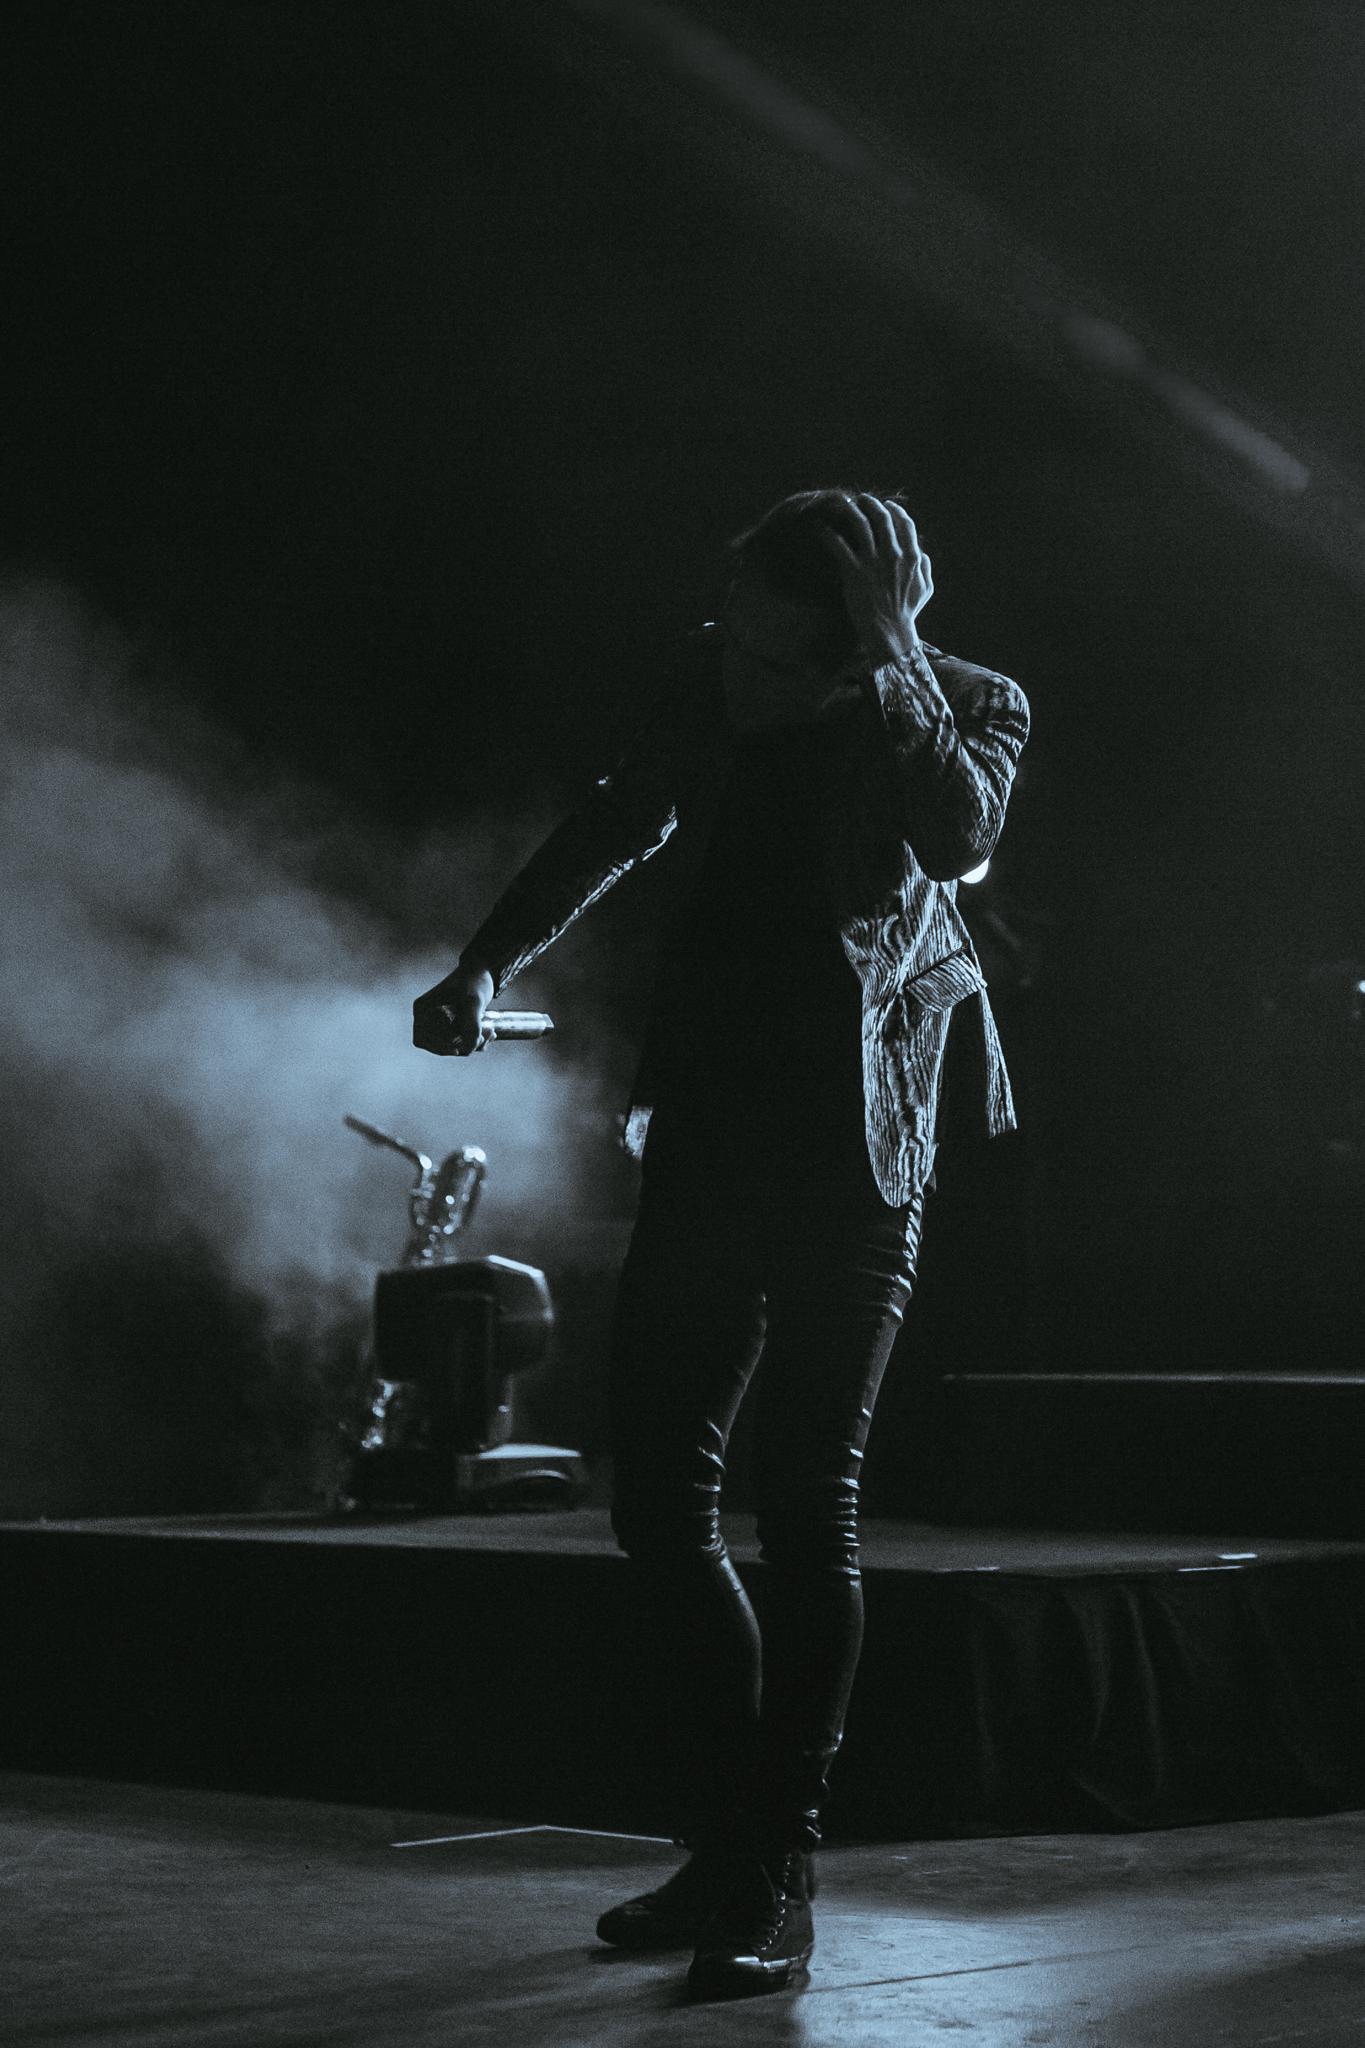 Mitch Lowe Photo - Panic At The Disco - Riverstage-14.jpg